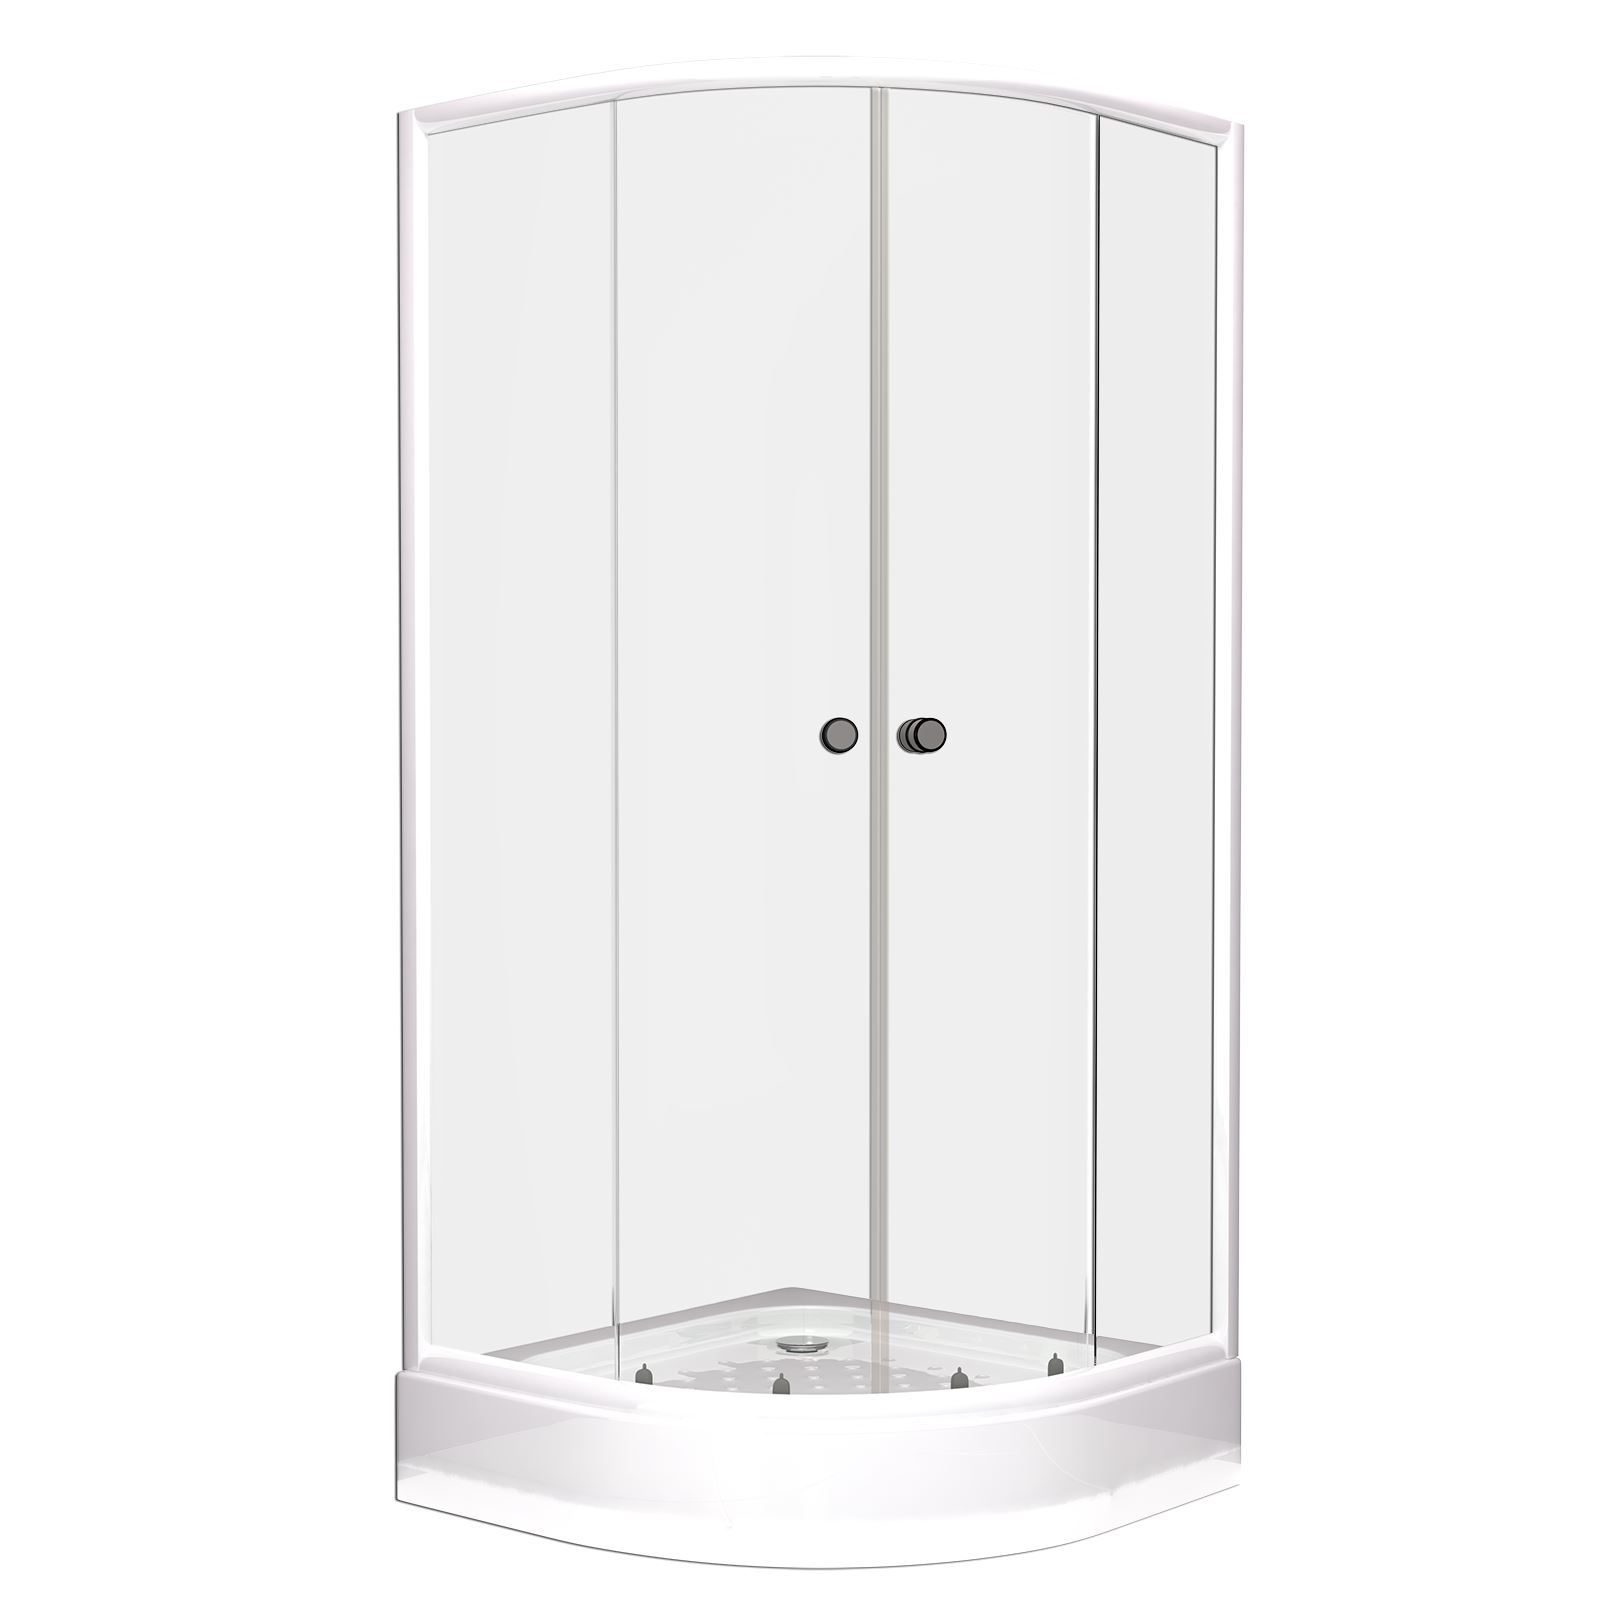 900 X 900 Modern Quadrant Shower Enclosure Corner Cubicle